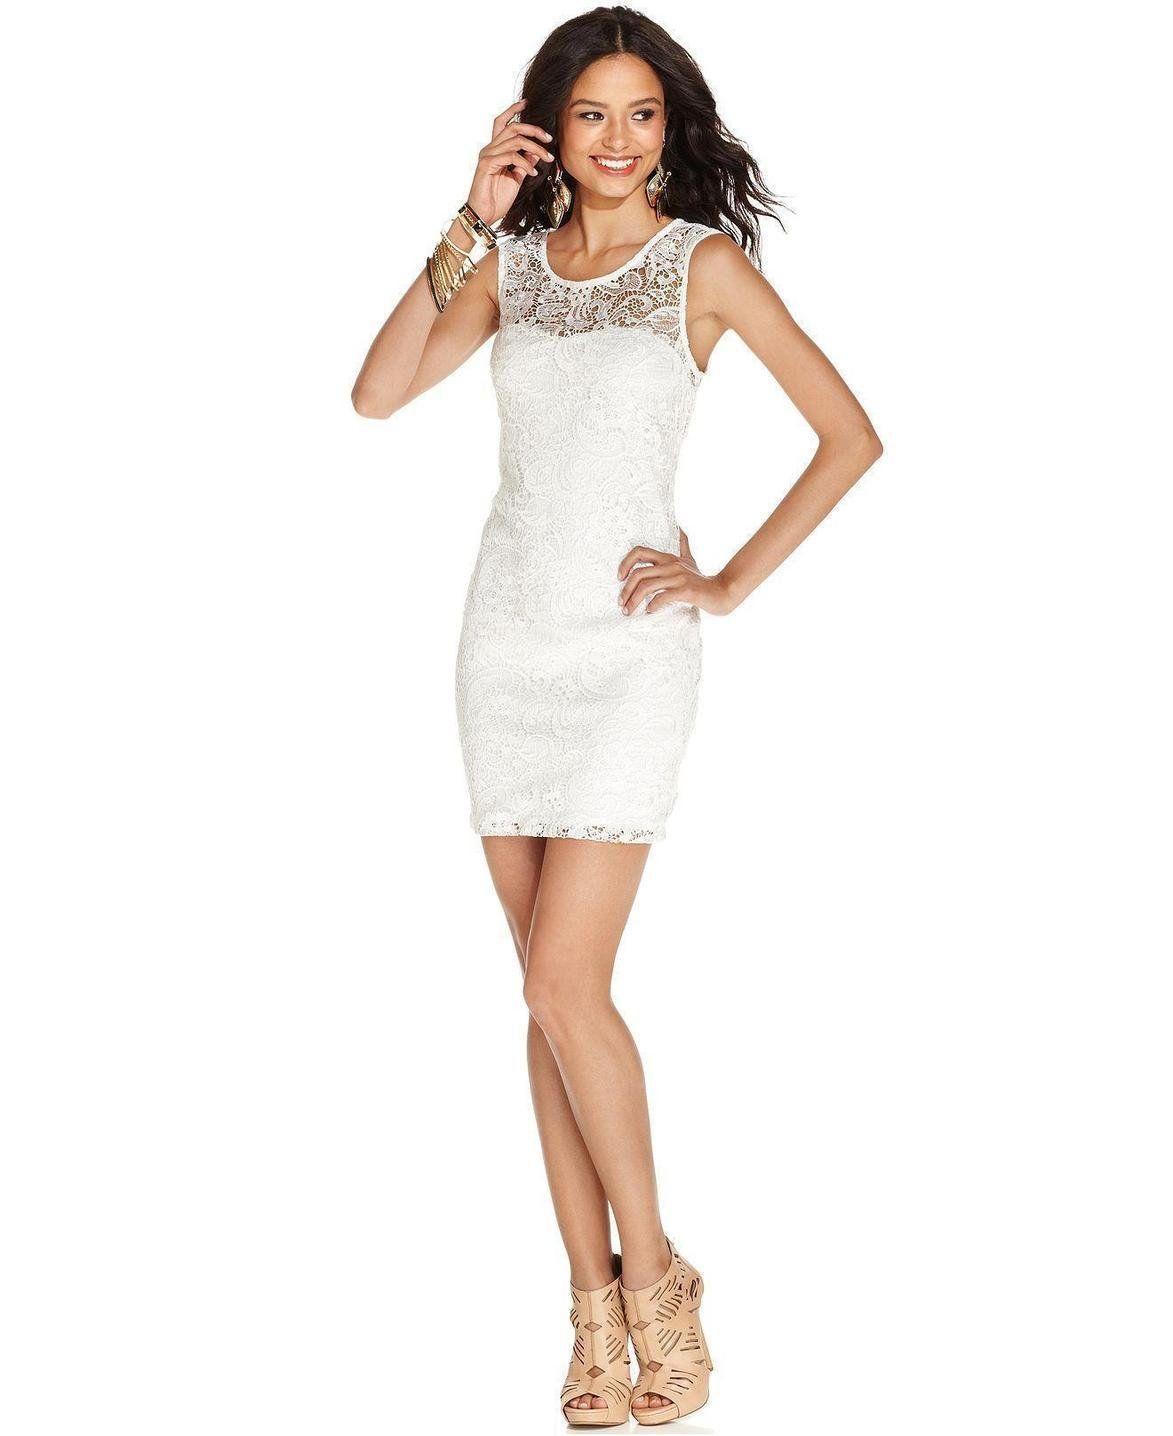 As U Wish Juniors\' Lace Cutout Bodycon Dress http://picvpic.com ...